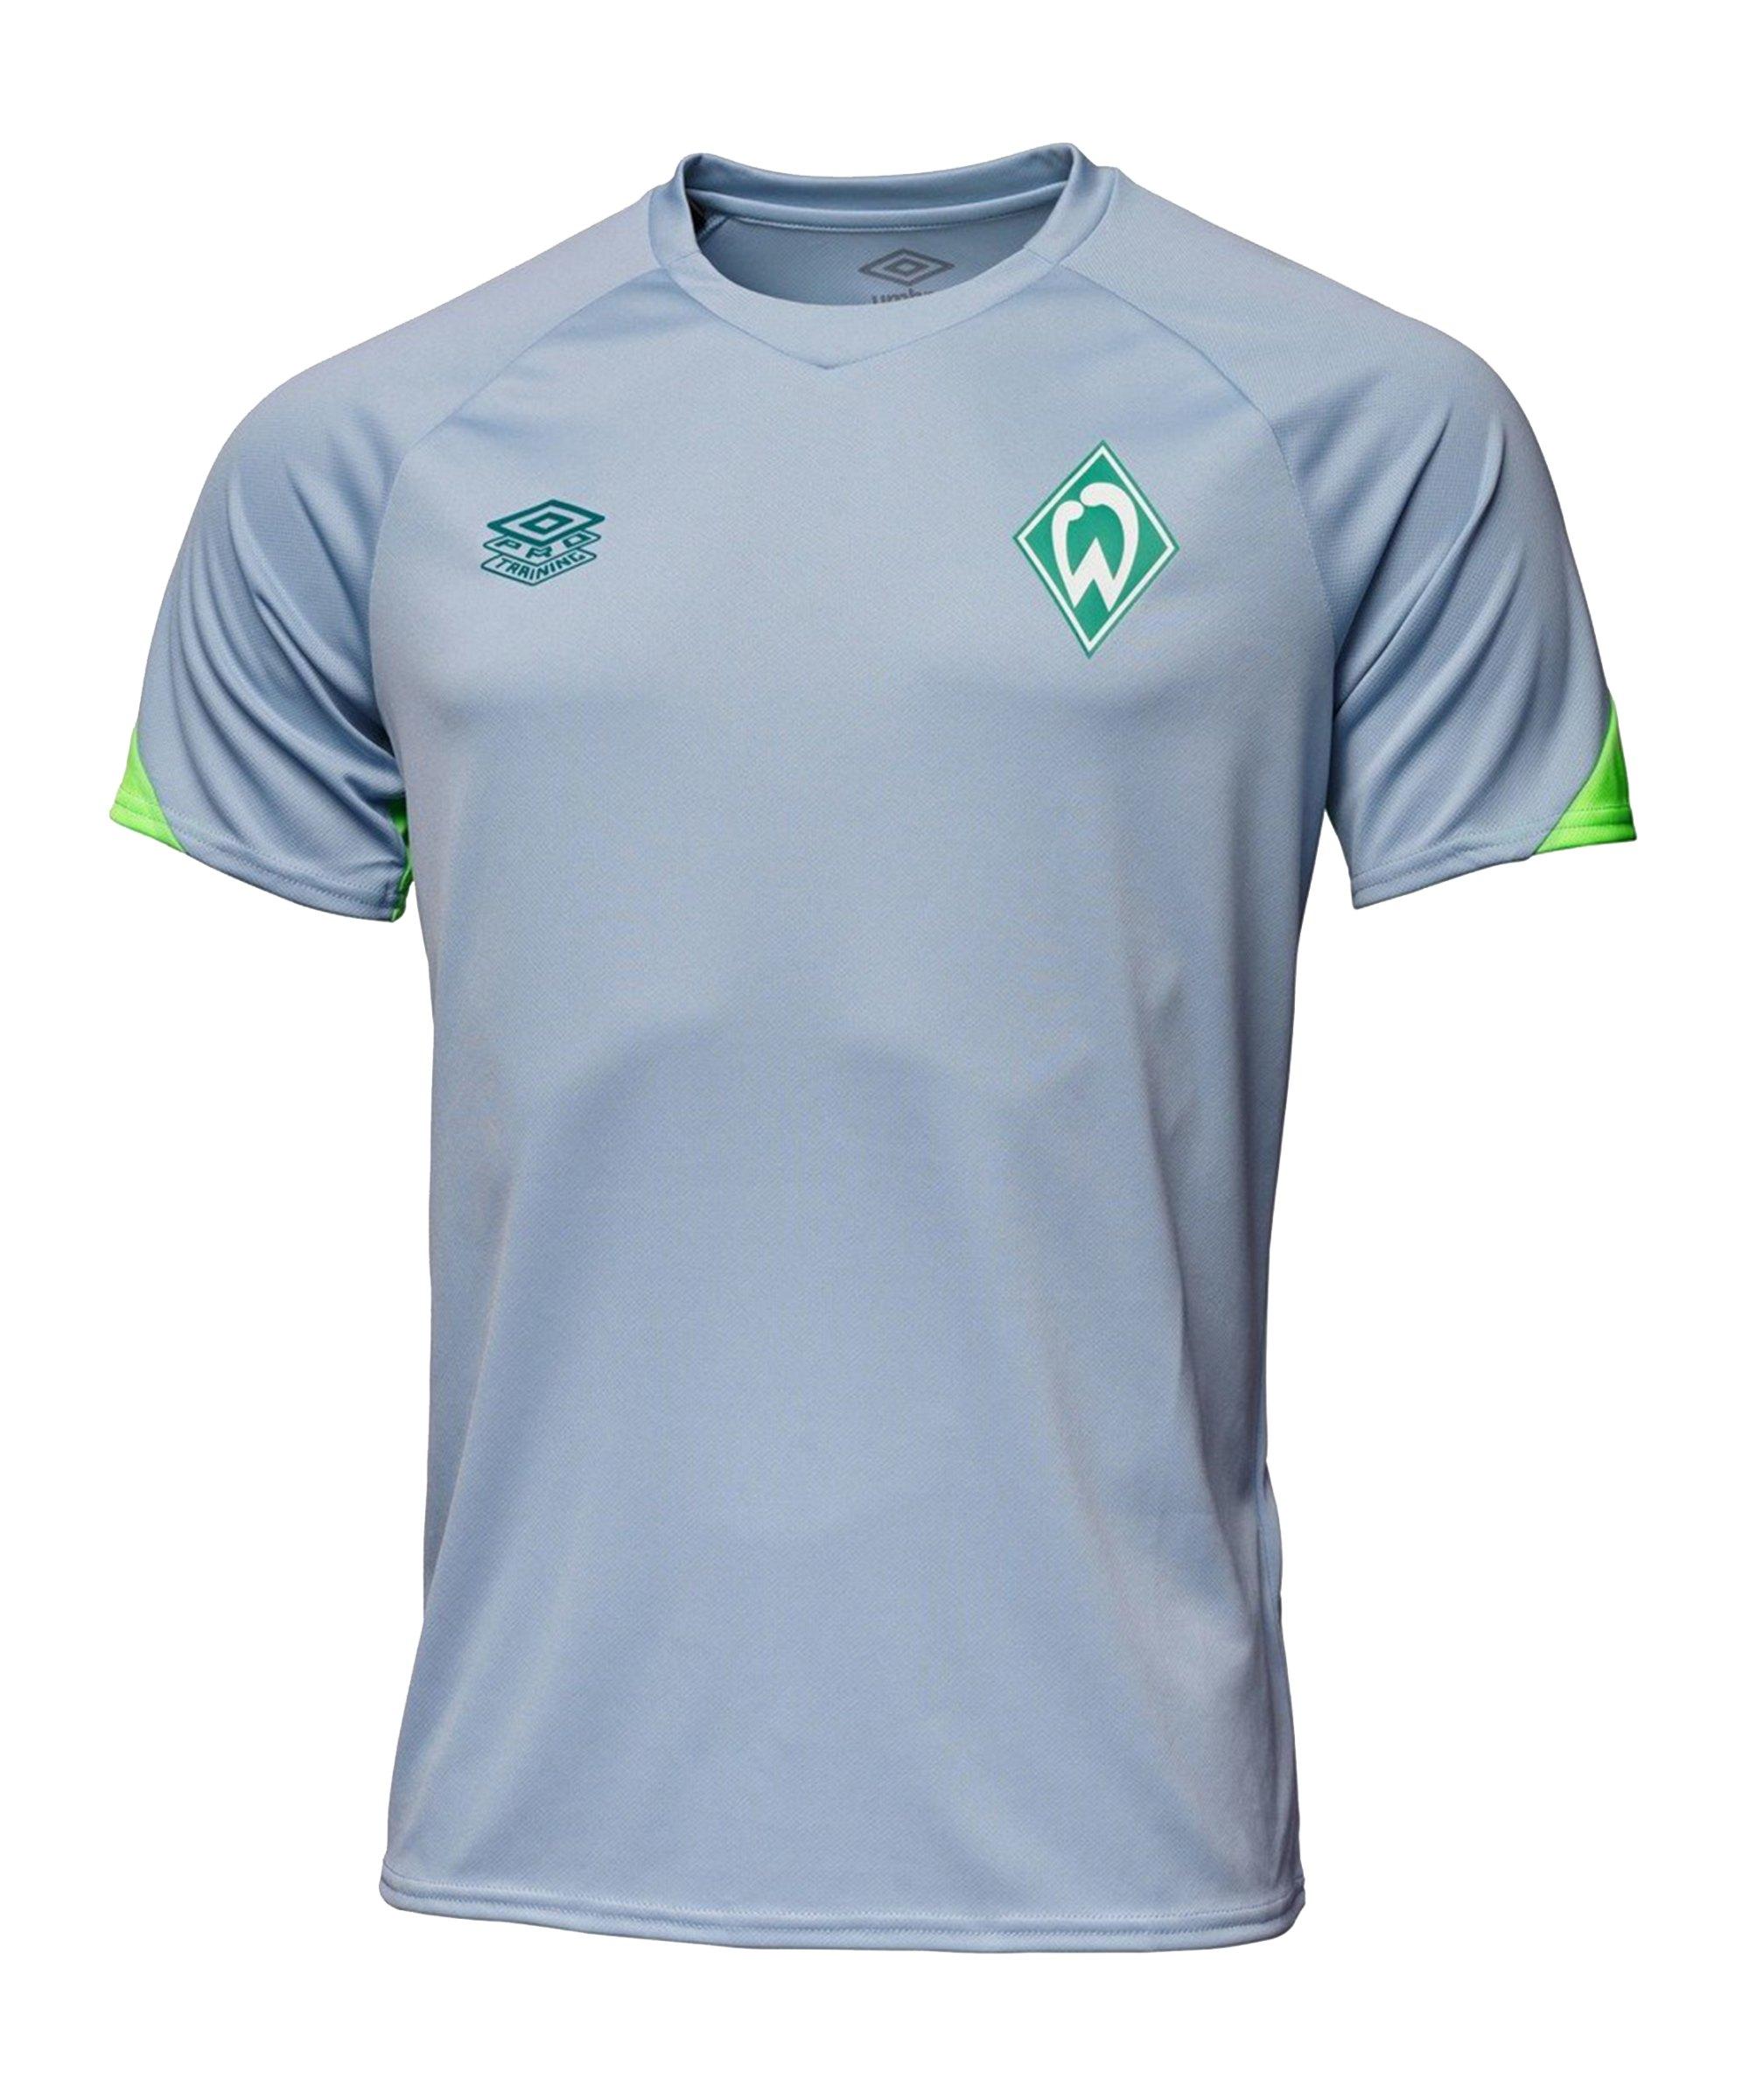 Umbro SV Werder Bremen Training T-Shirt Blau - blau